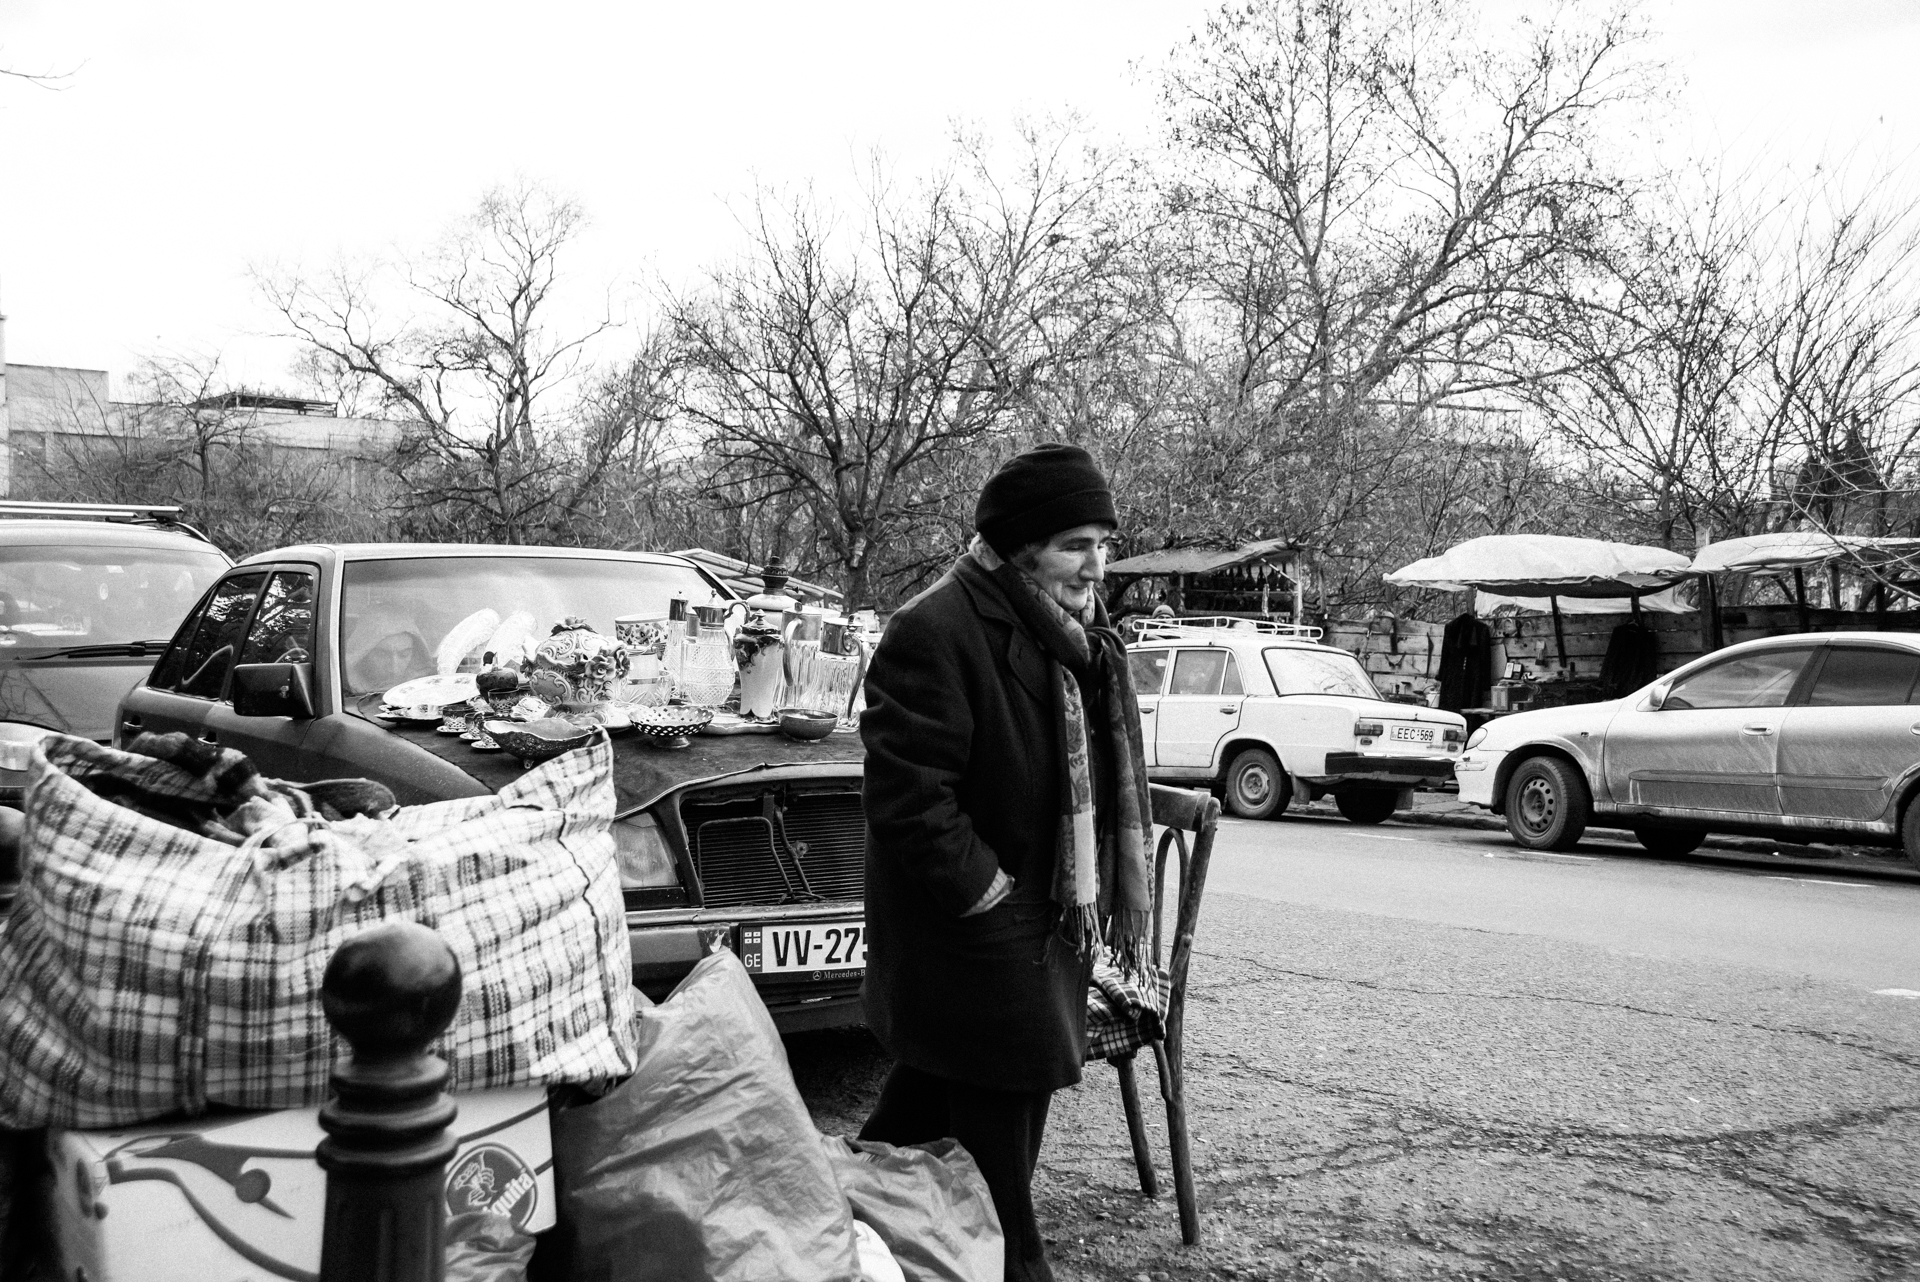 tbilisi-georgia-black-and-white-photography (3).jpg